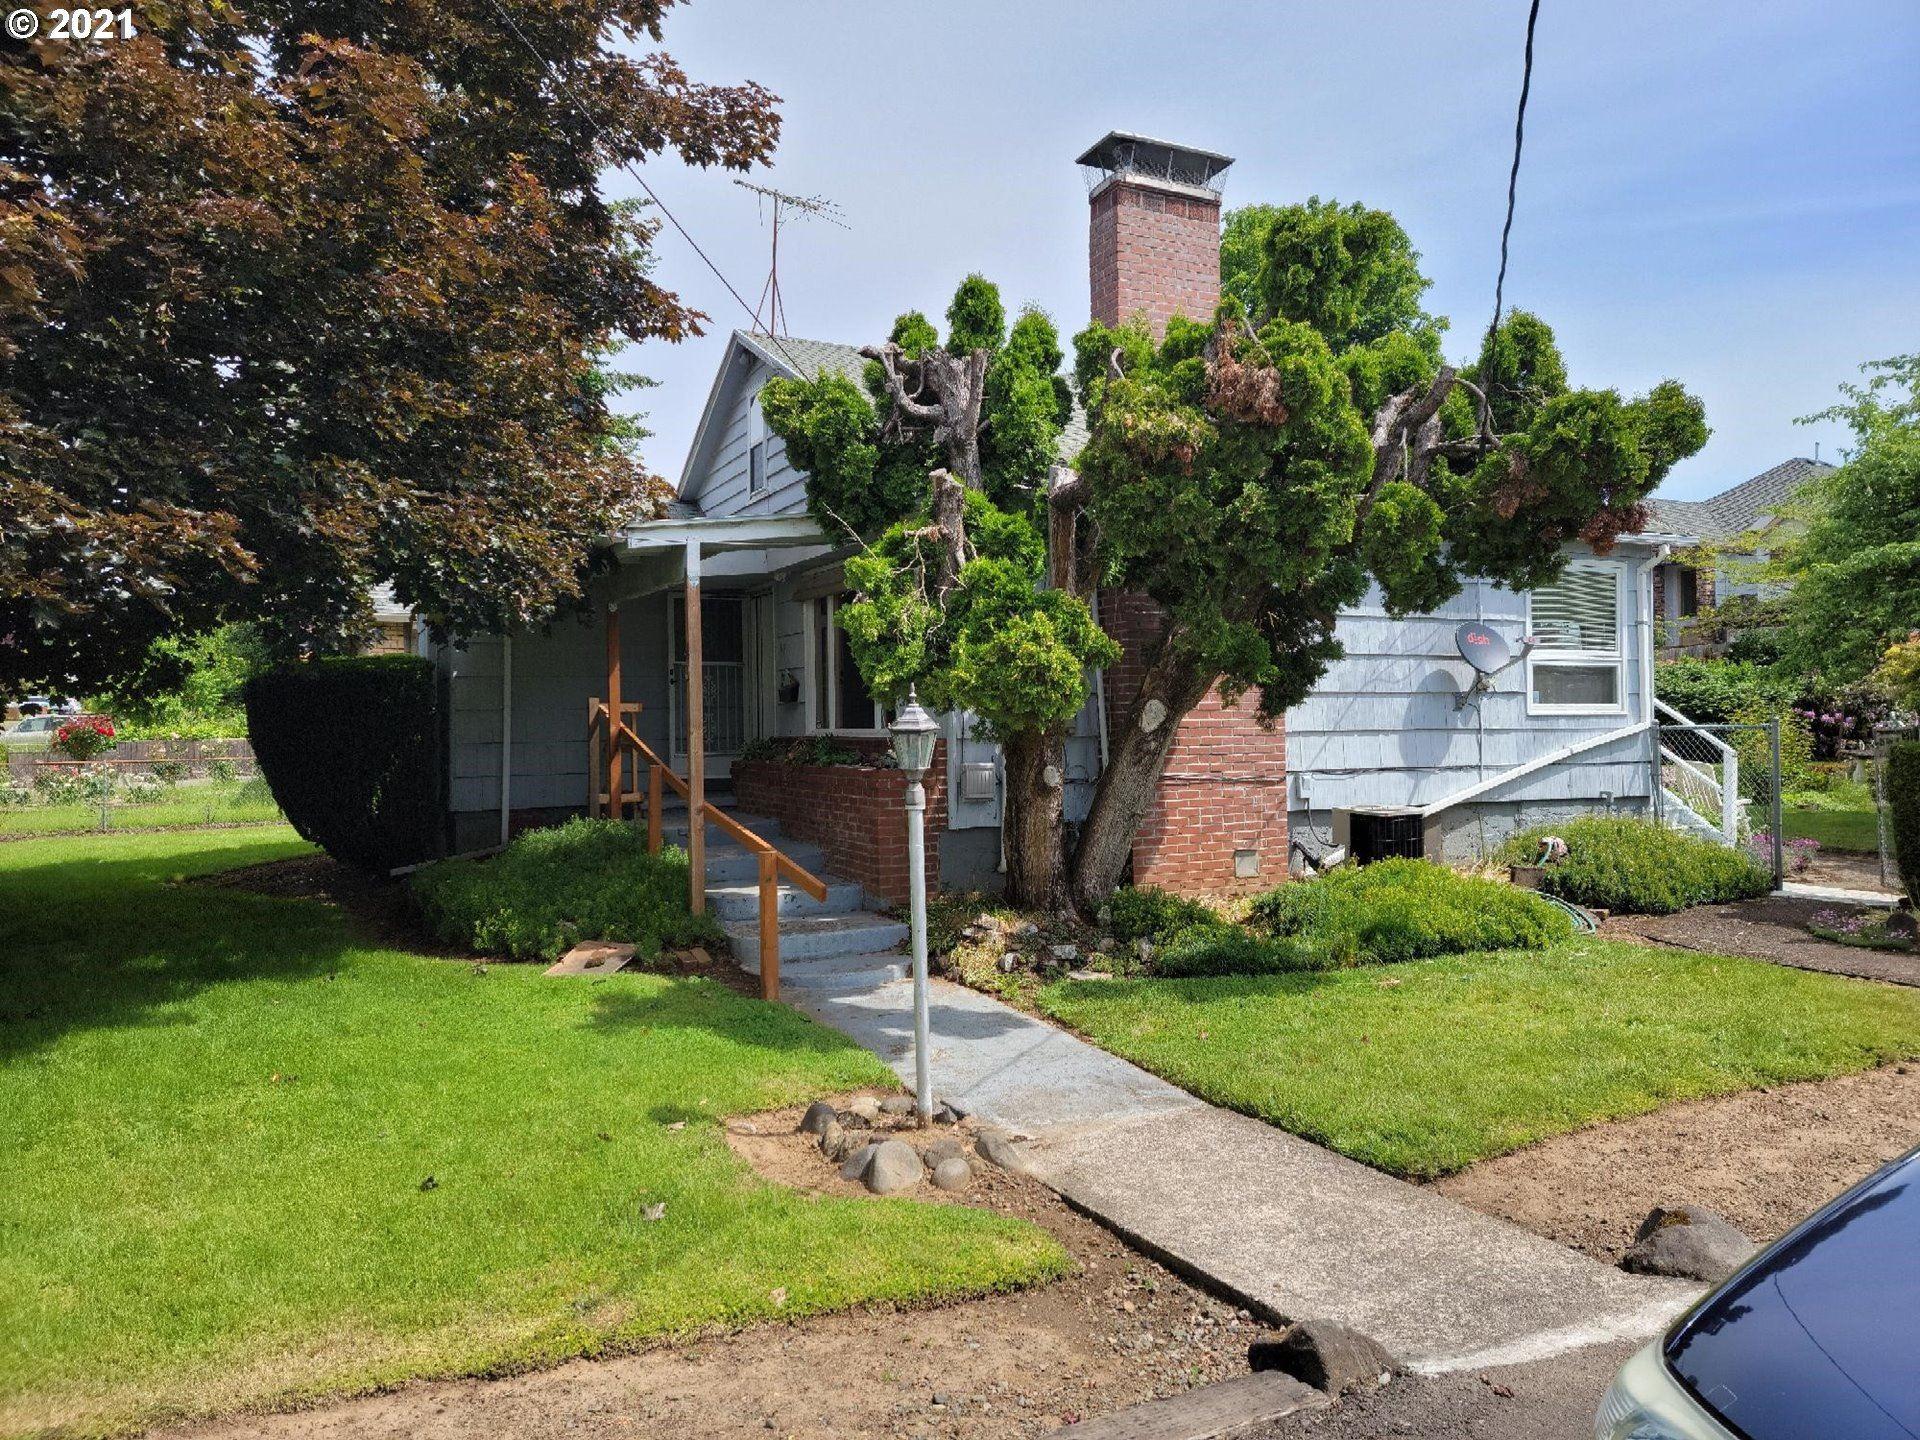 40 NE 133RD AVE, Portland, OR 97230 - MLS#: 21395508